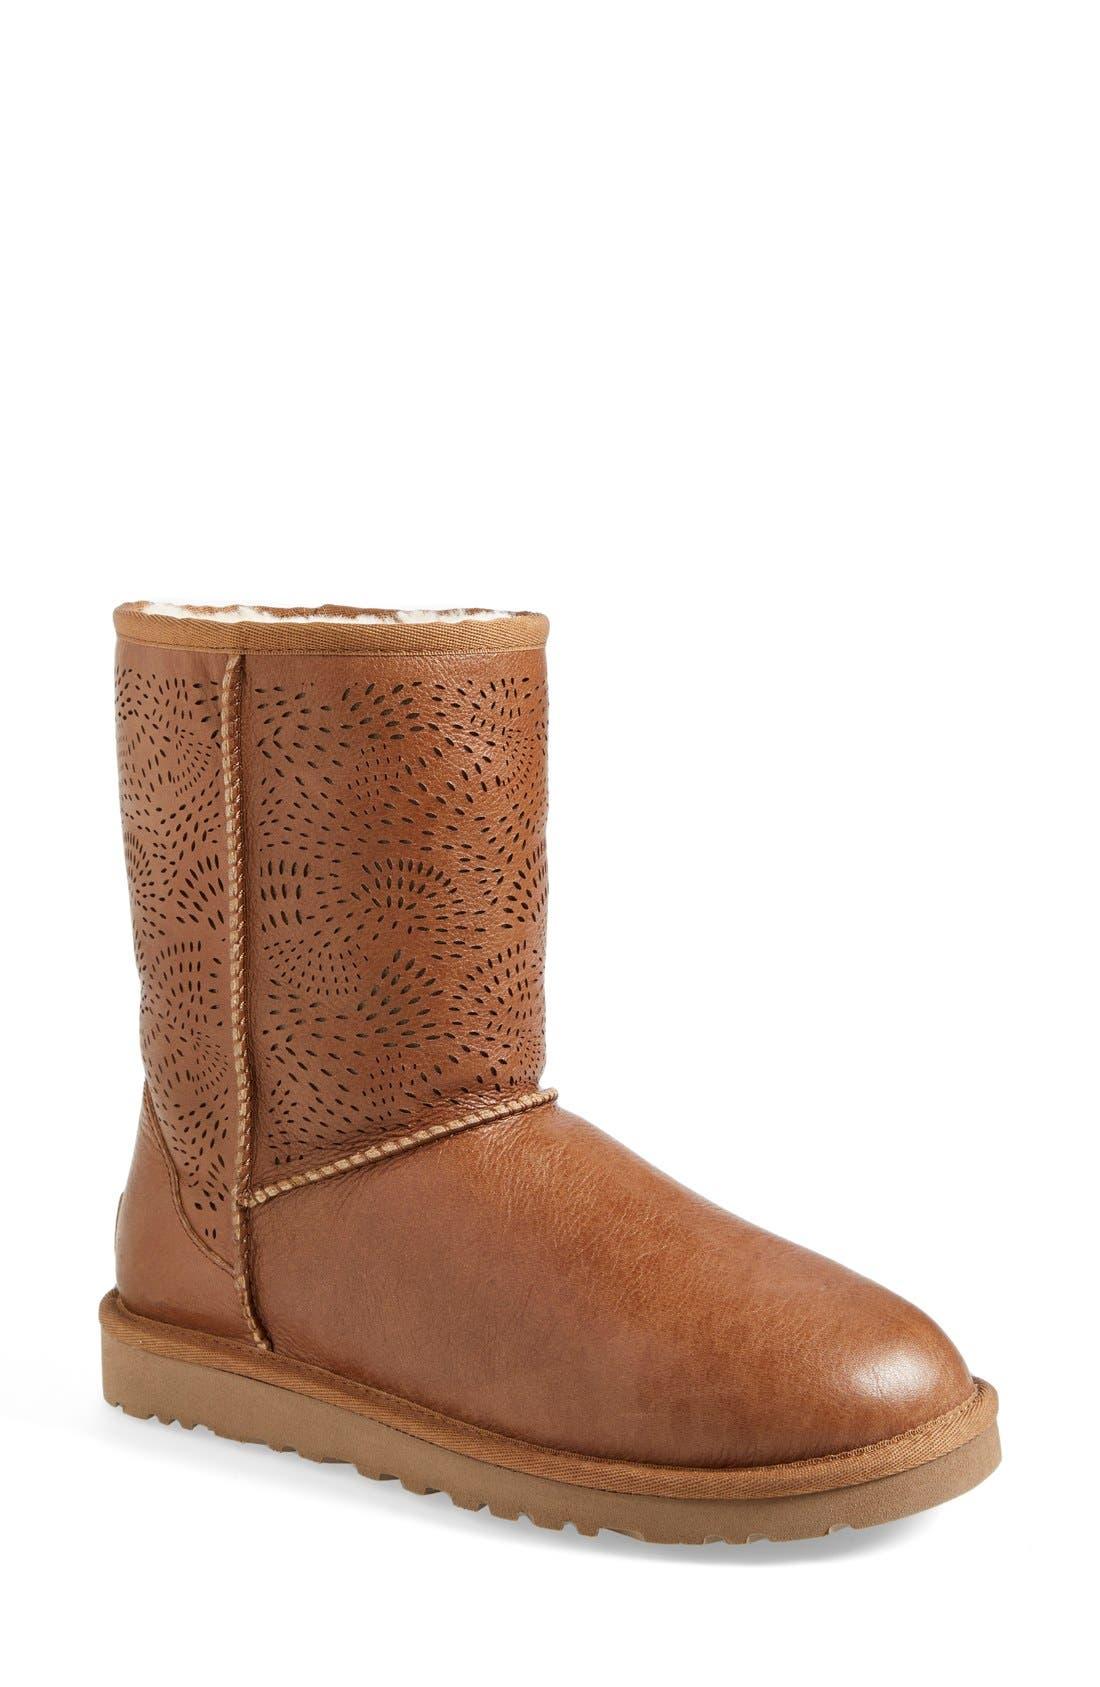 Main Image - UGG® Australia 'Triana' Perforated Boot (Women)